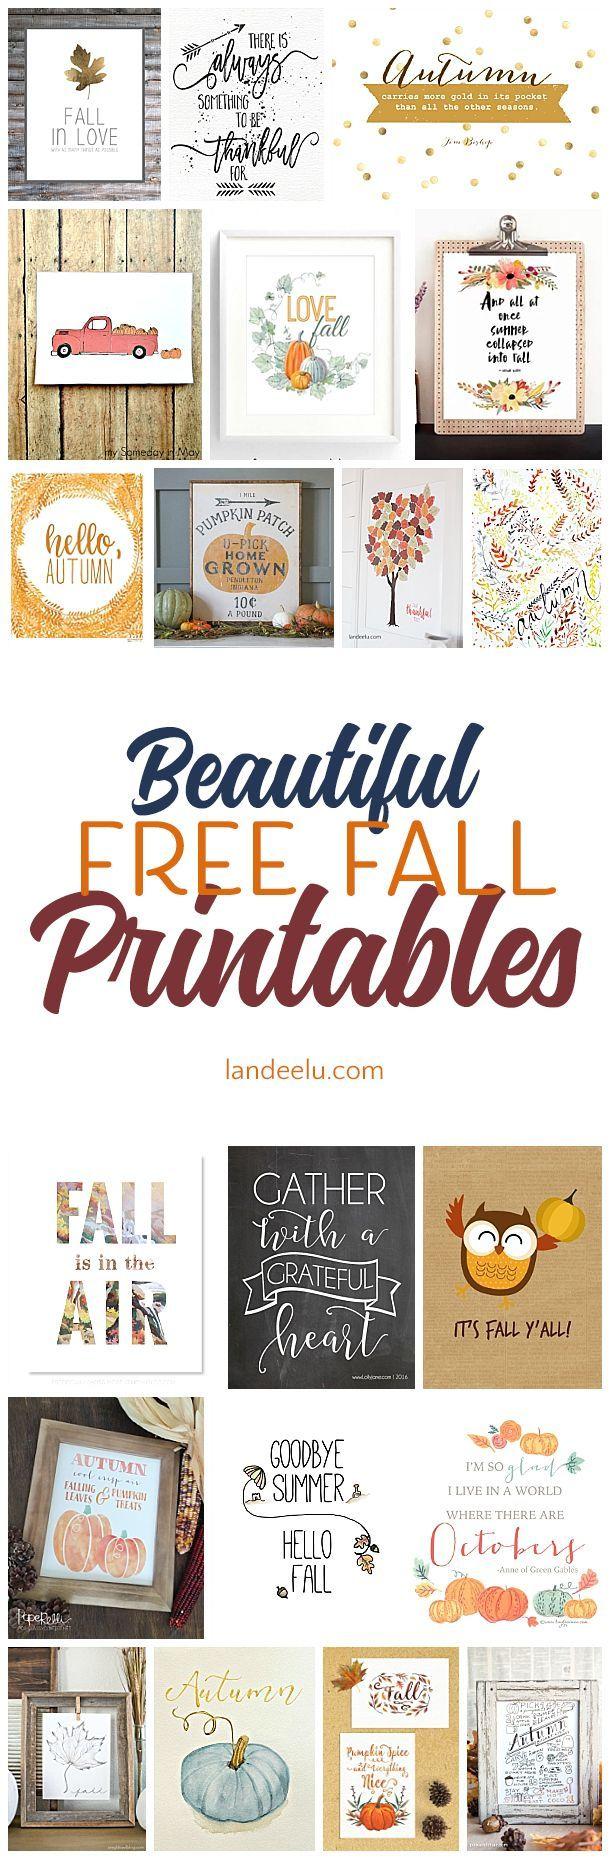 20 Free Fall Printables For Your Home | Actividades para niños ...